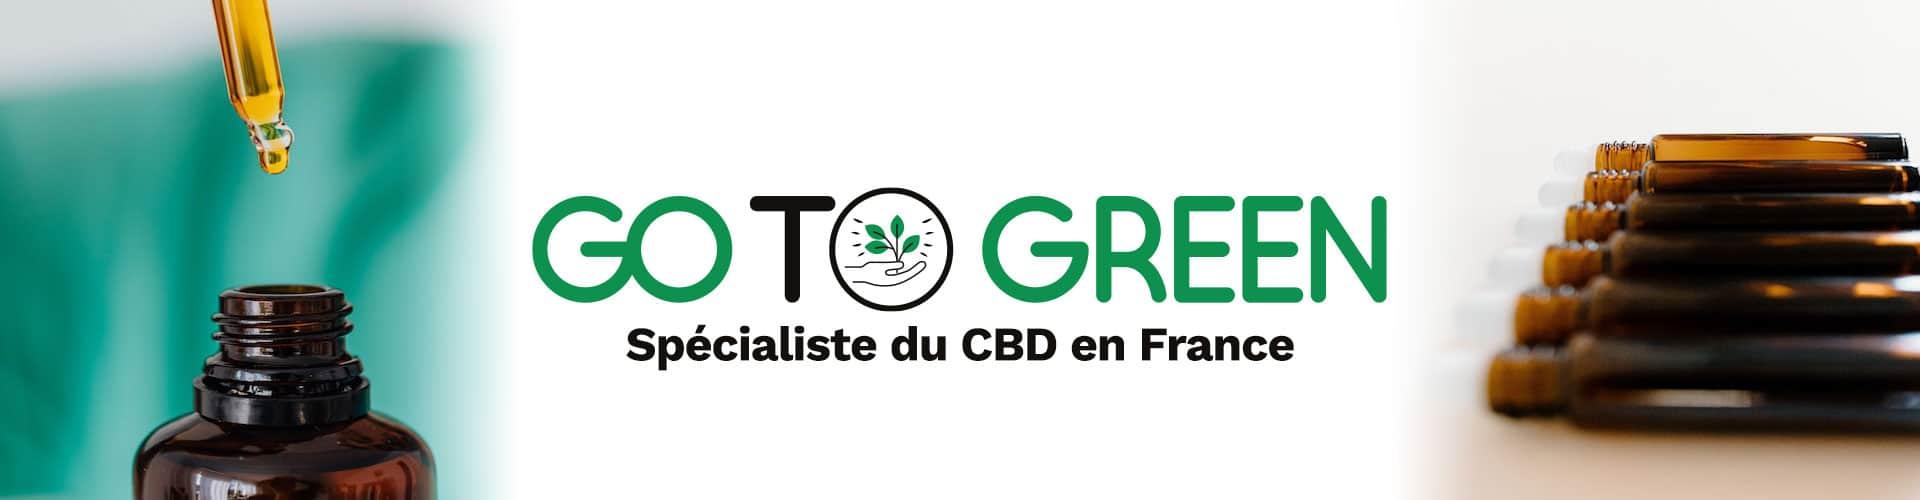 cbd pas cher qualite bio naturel livraison gratuite france